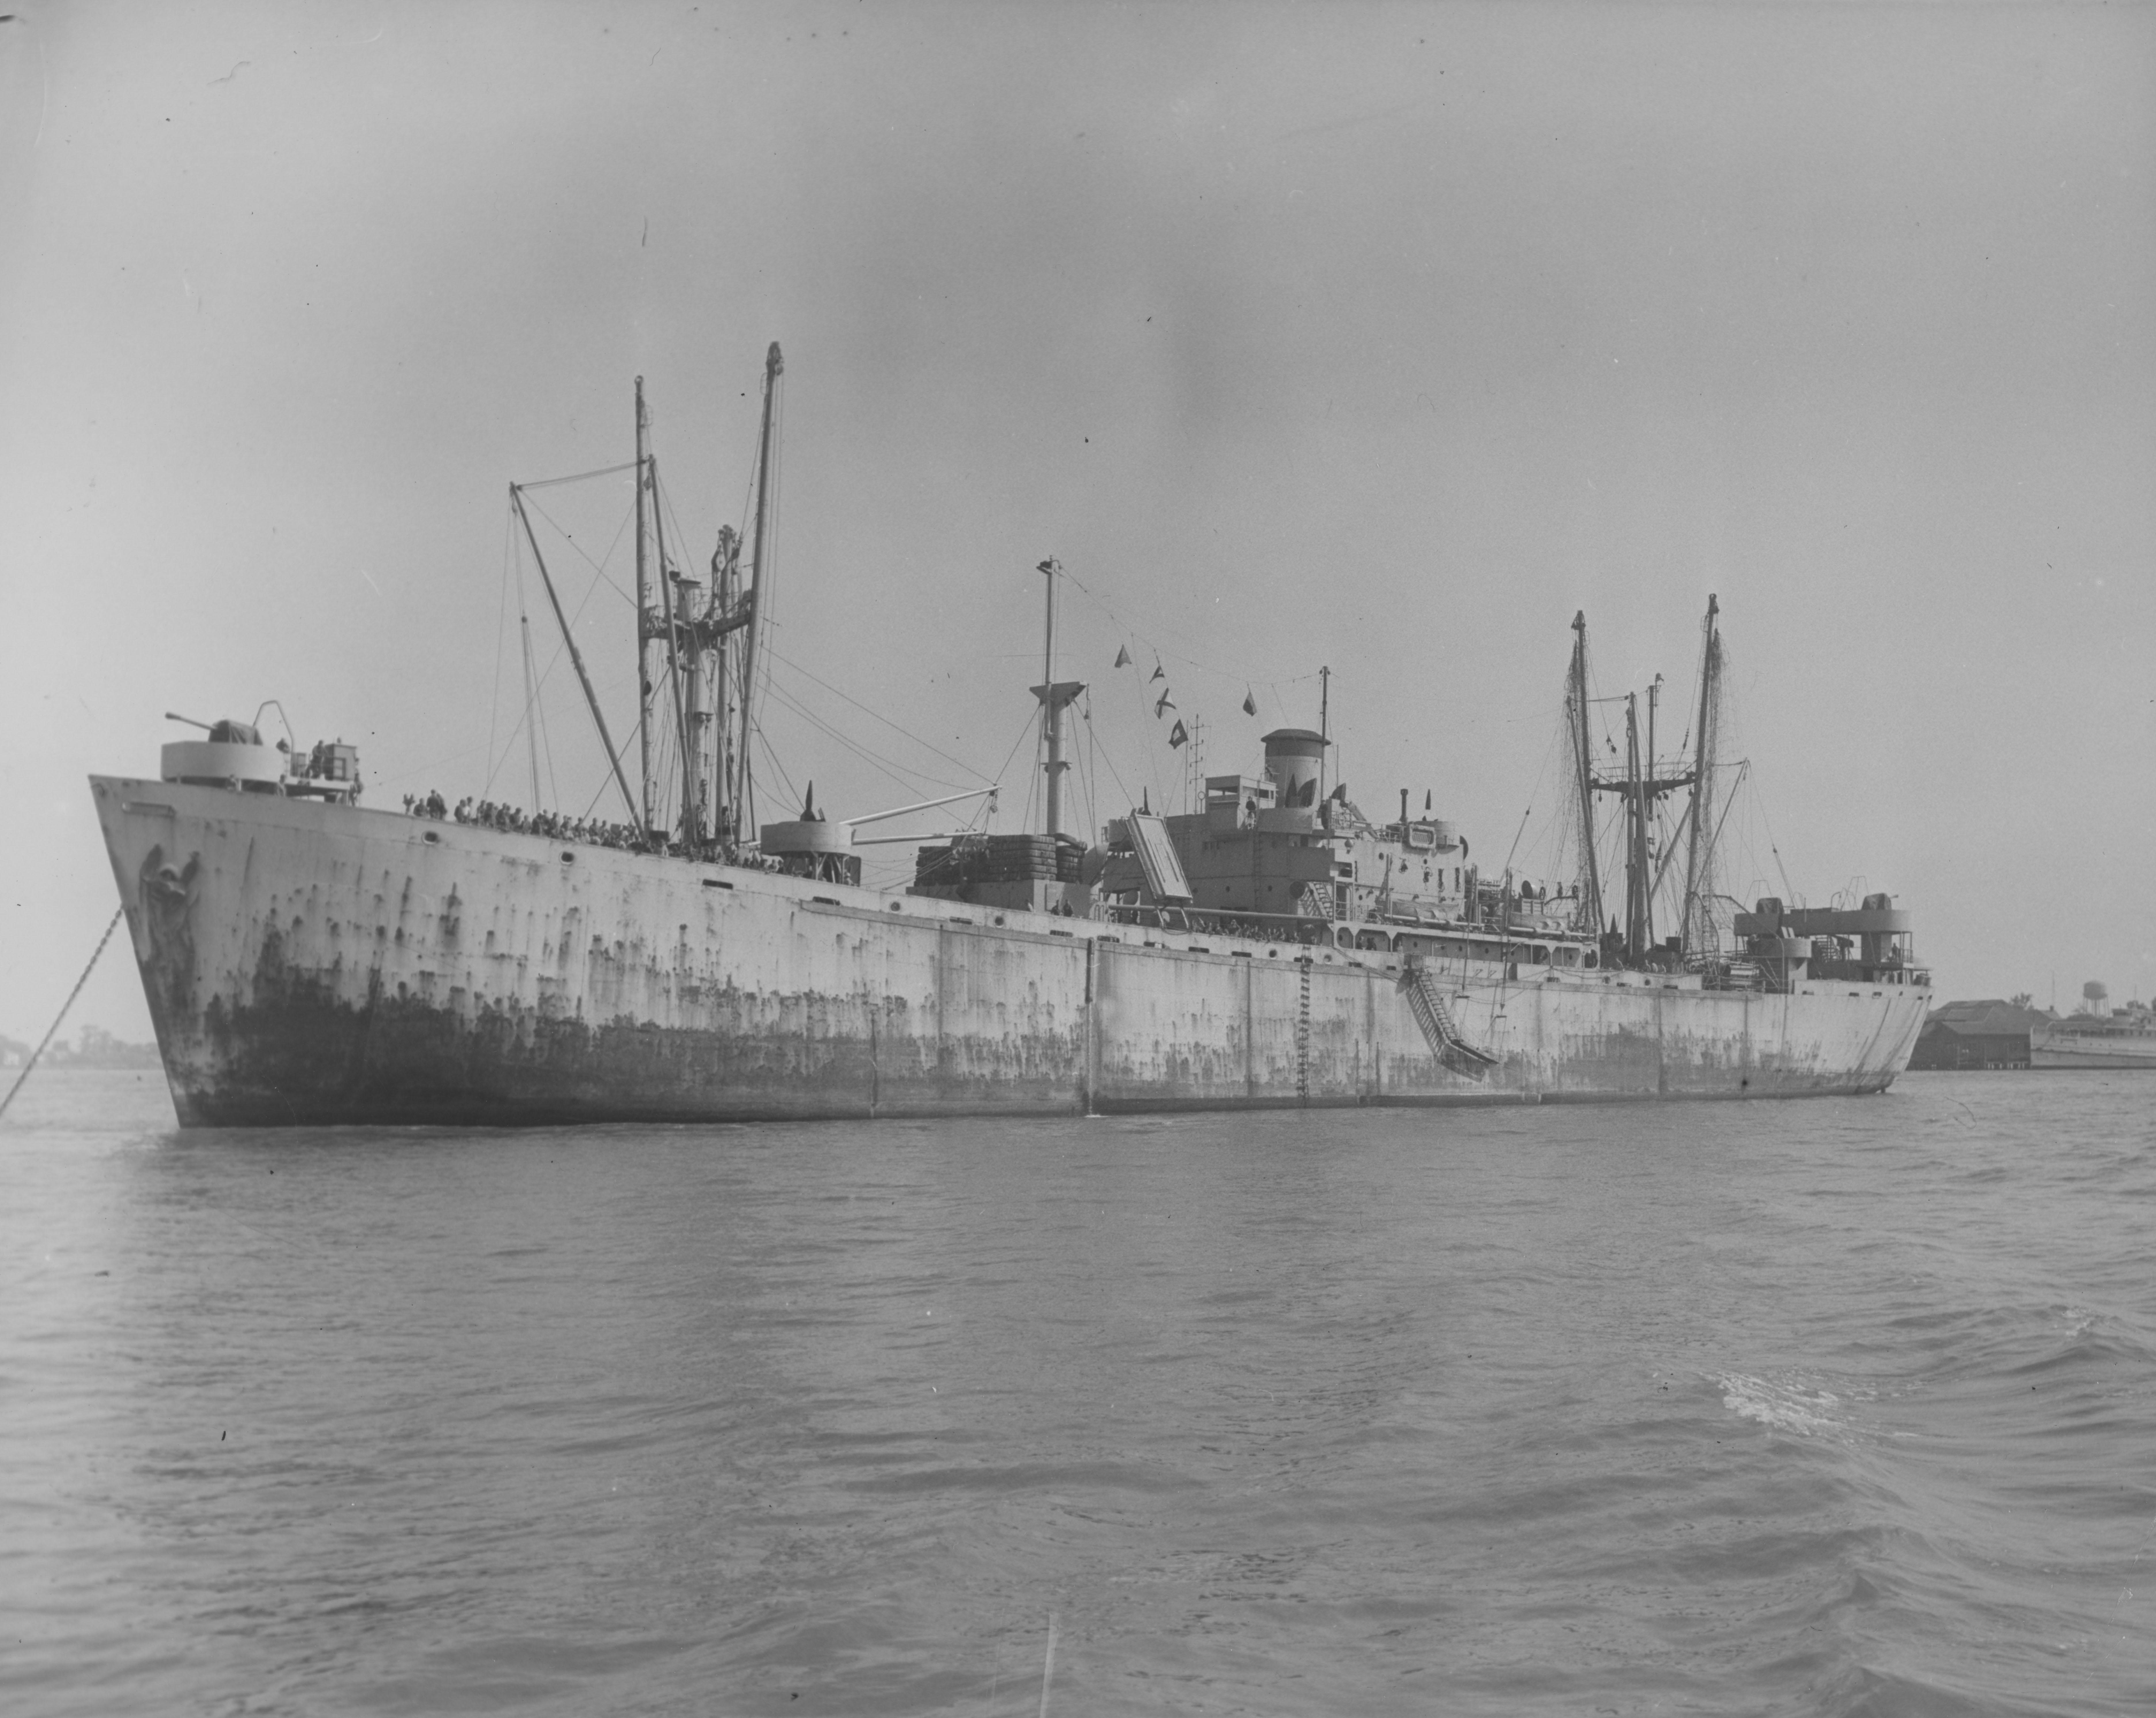 Liberty ship Joseph Warren in quarantine at Newport News with 300 German POWs on board